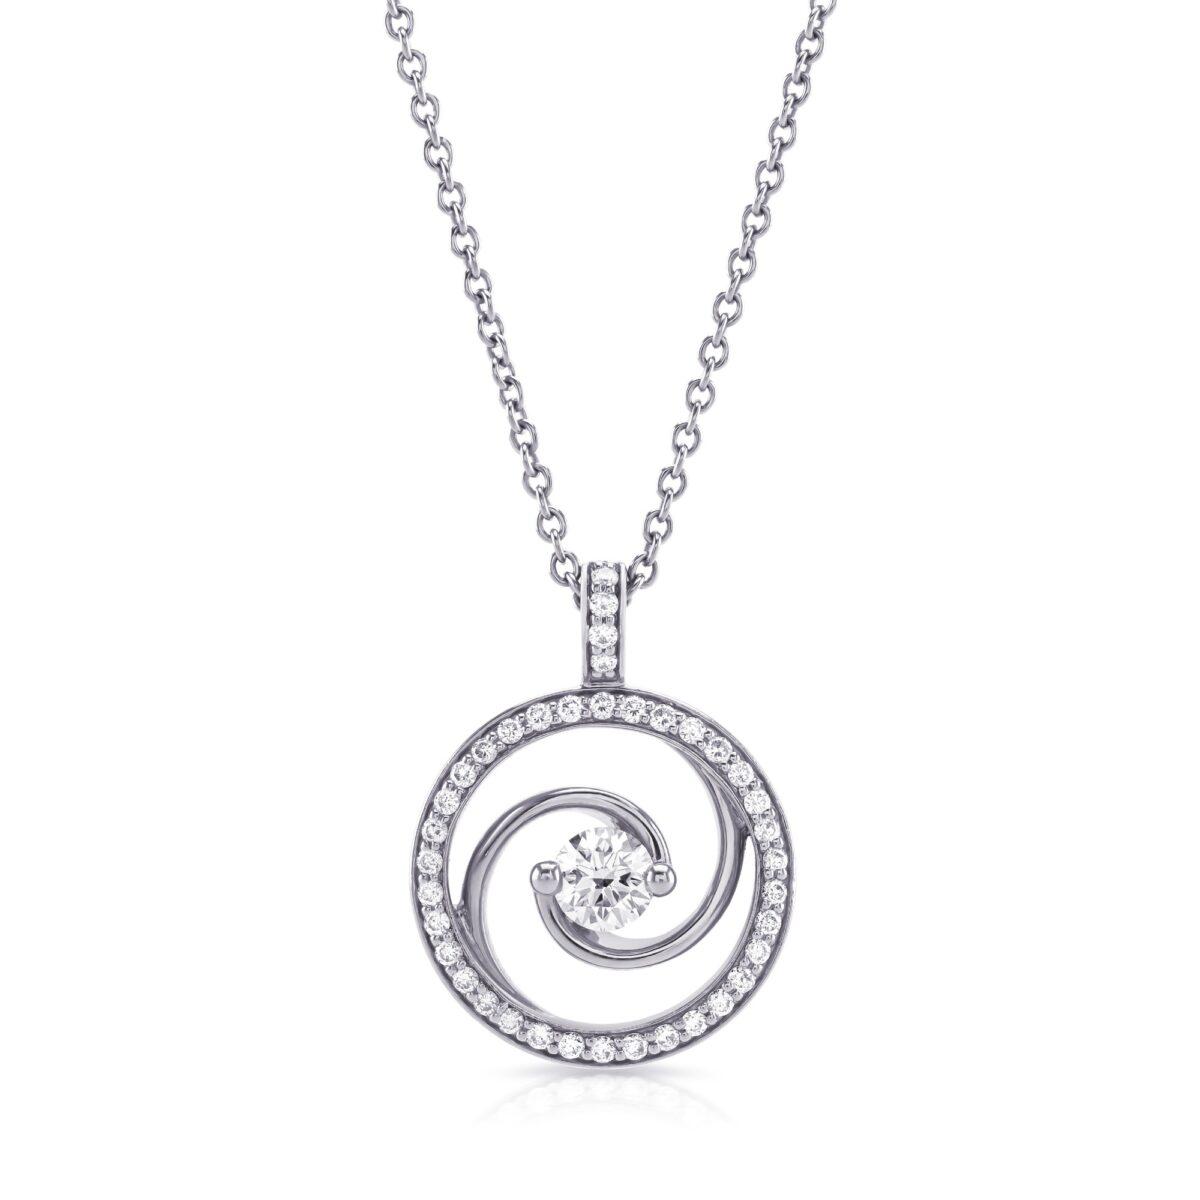 Whirlwind White Gold Diamond Pendant